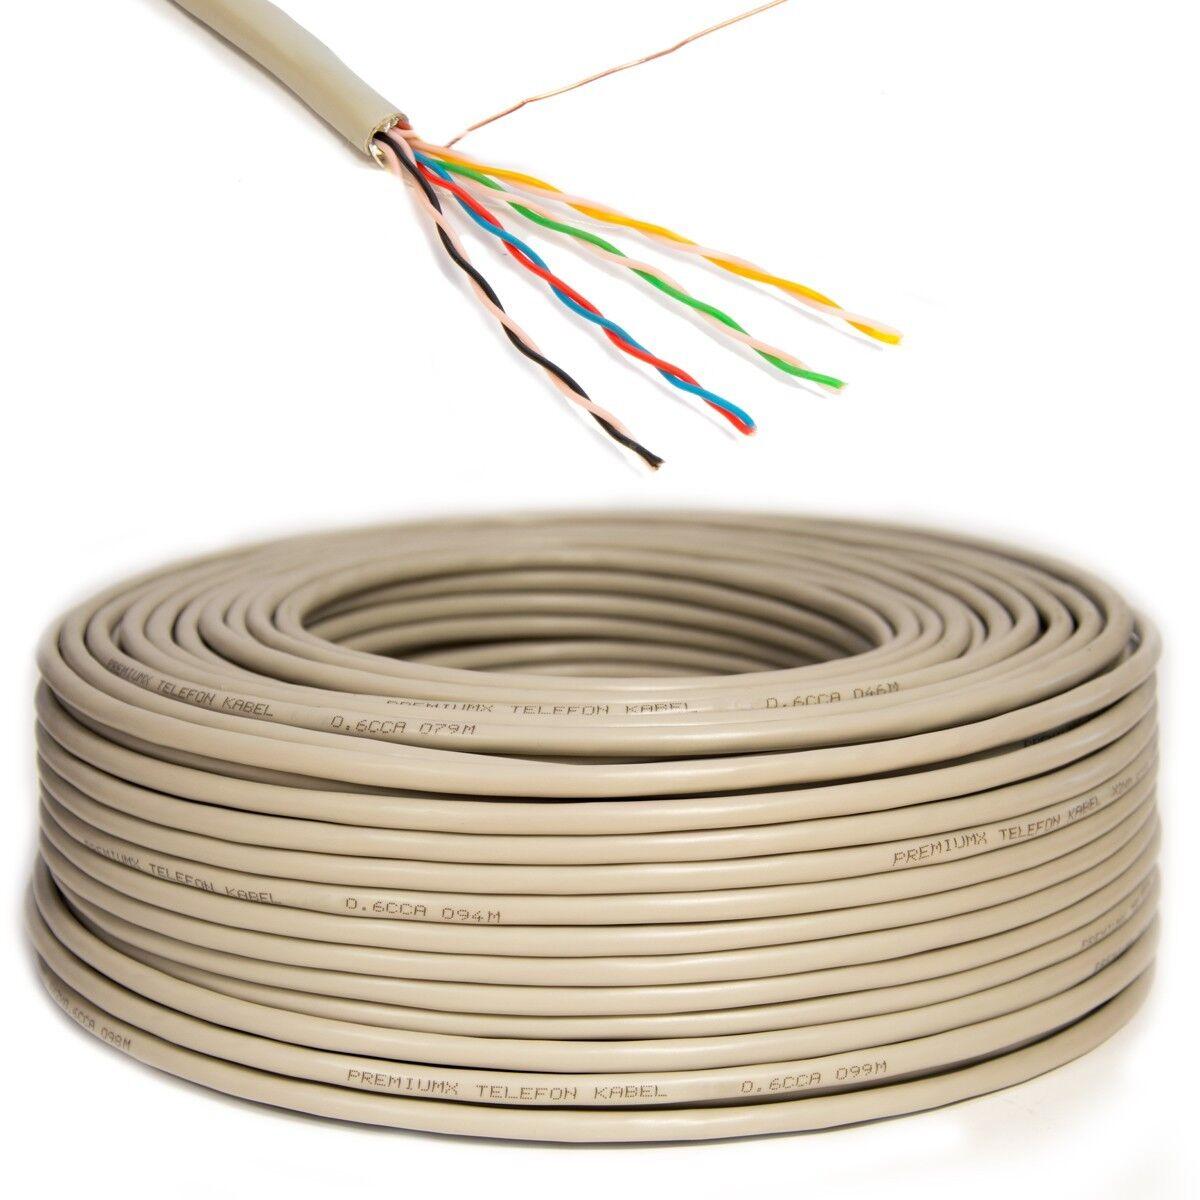 50m Telefon Kabel 4x2x0,6mm 8 Adern Telefonkabel Leitung Verlegekabel Verlege